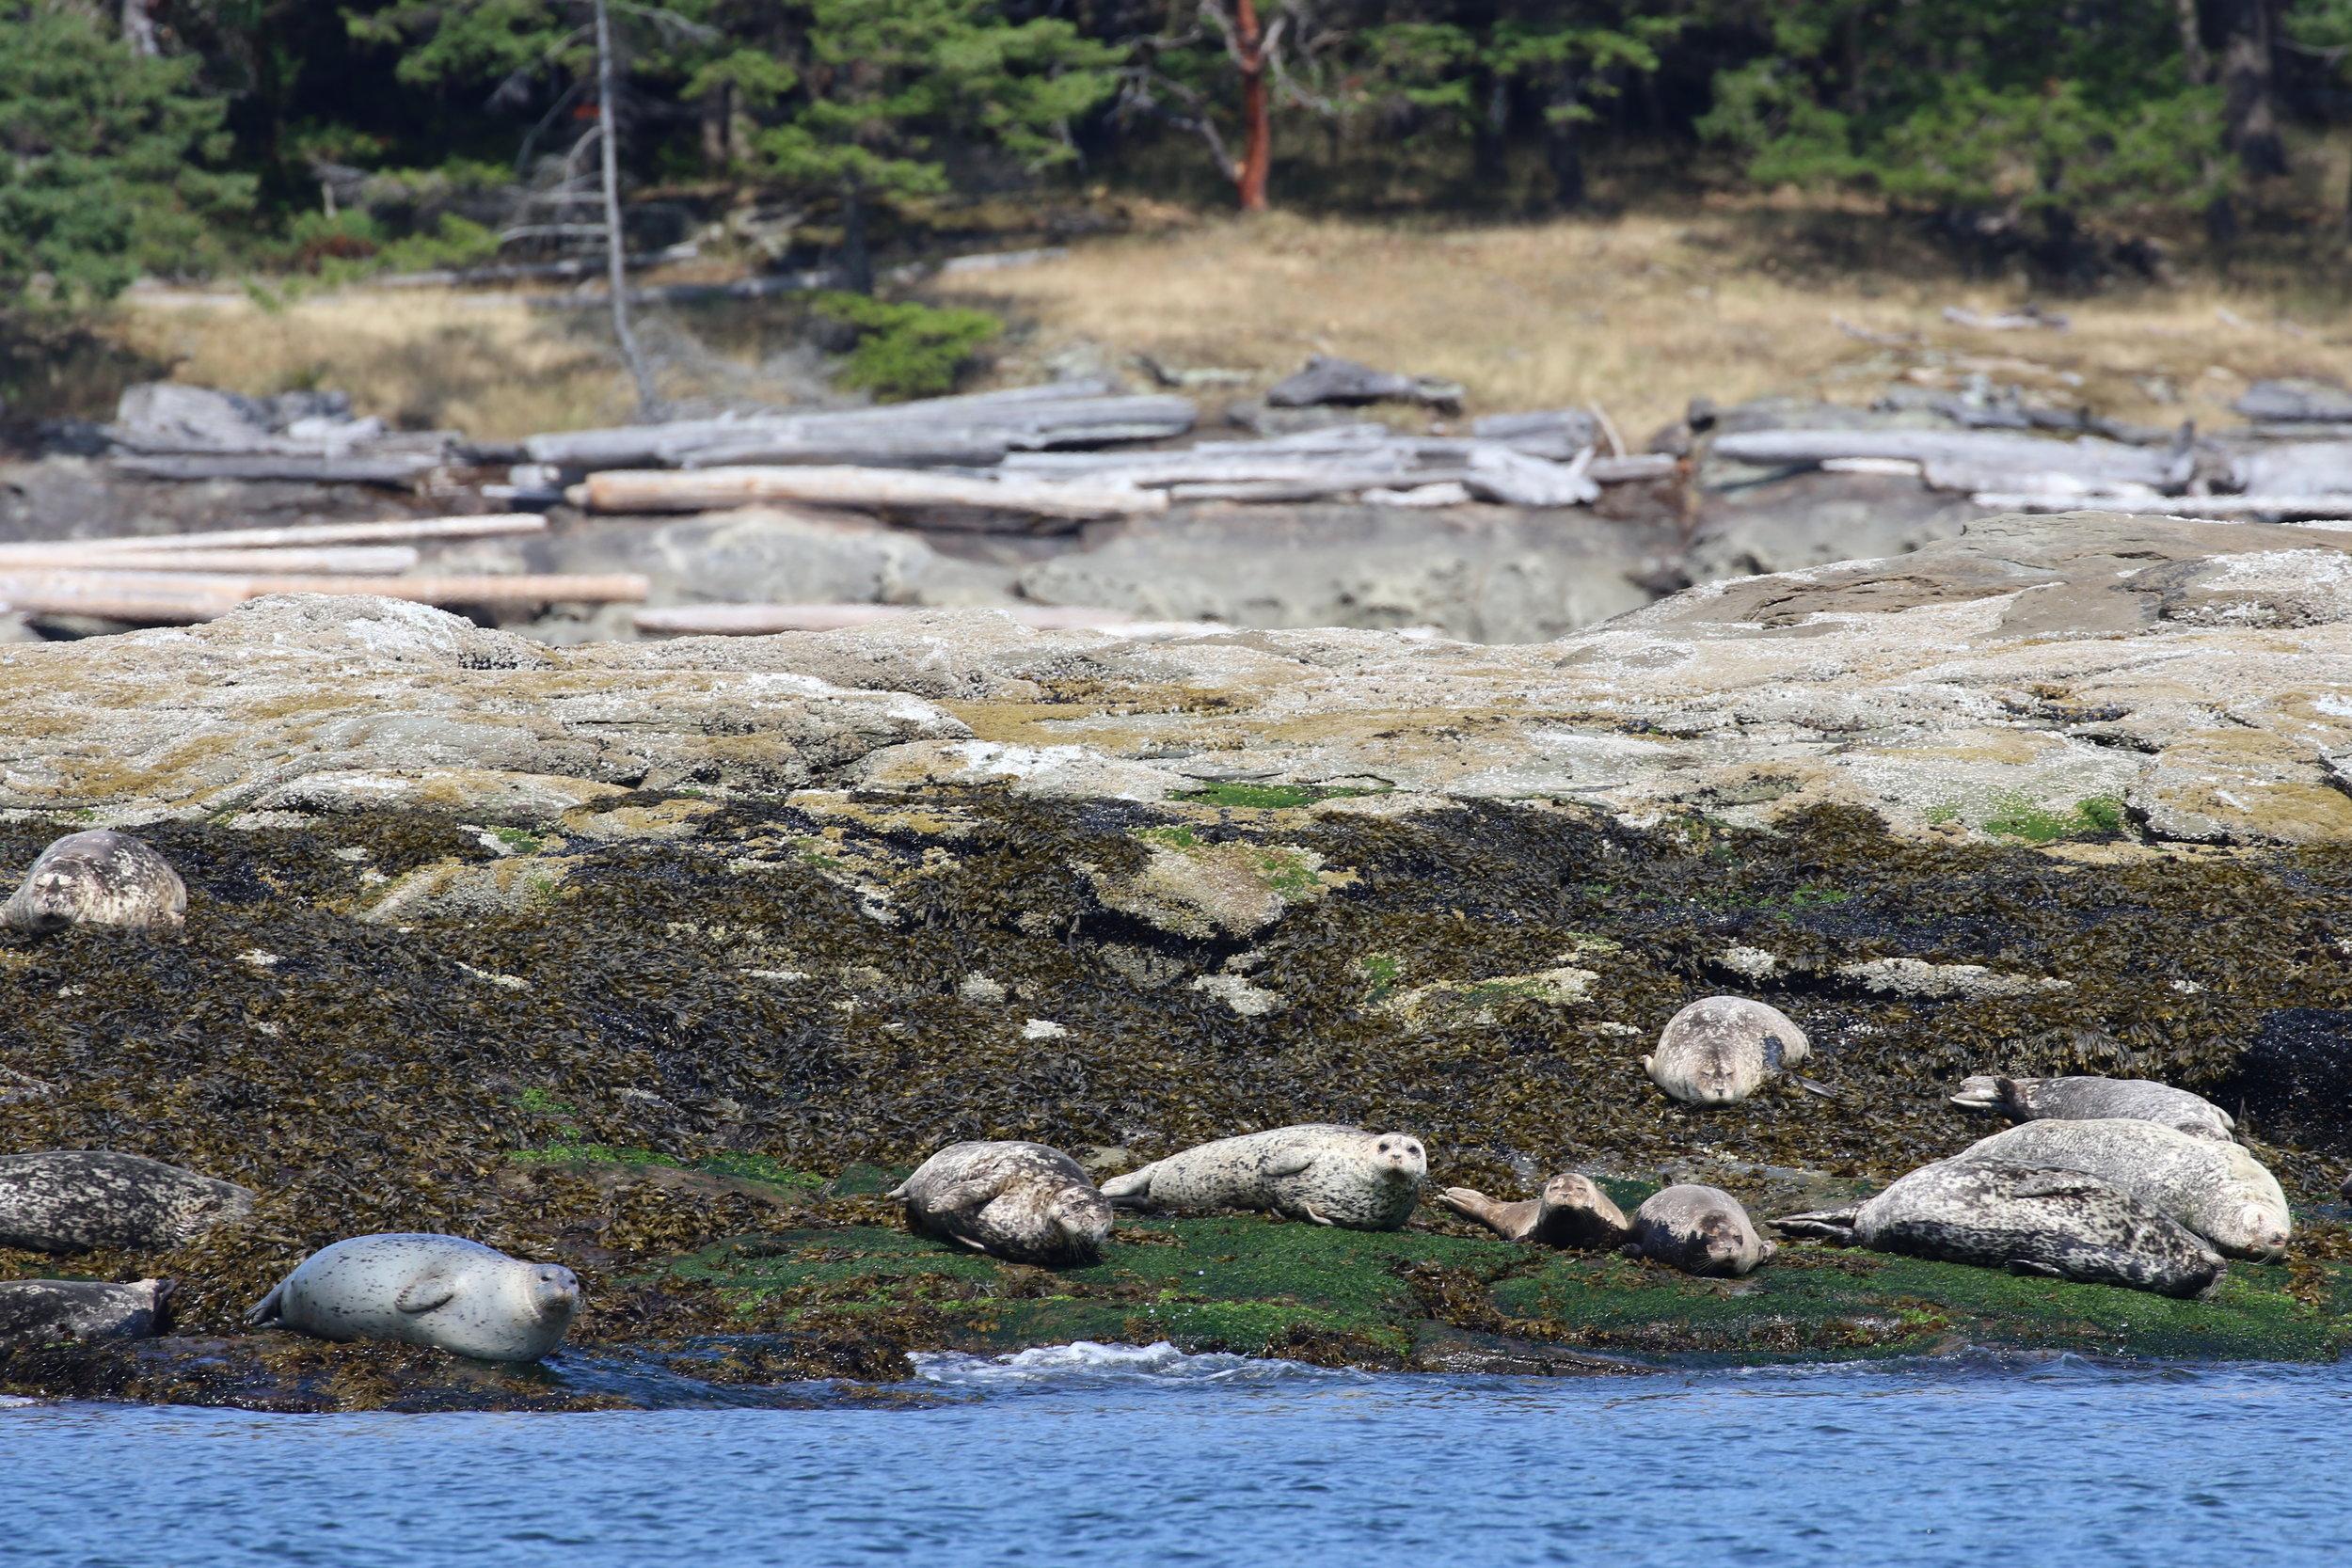 Harbour seals resting. Photo by Ryan Uslu (10:30).